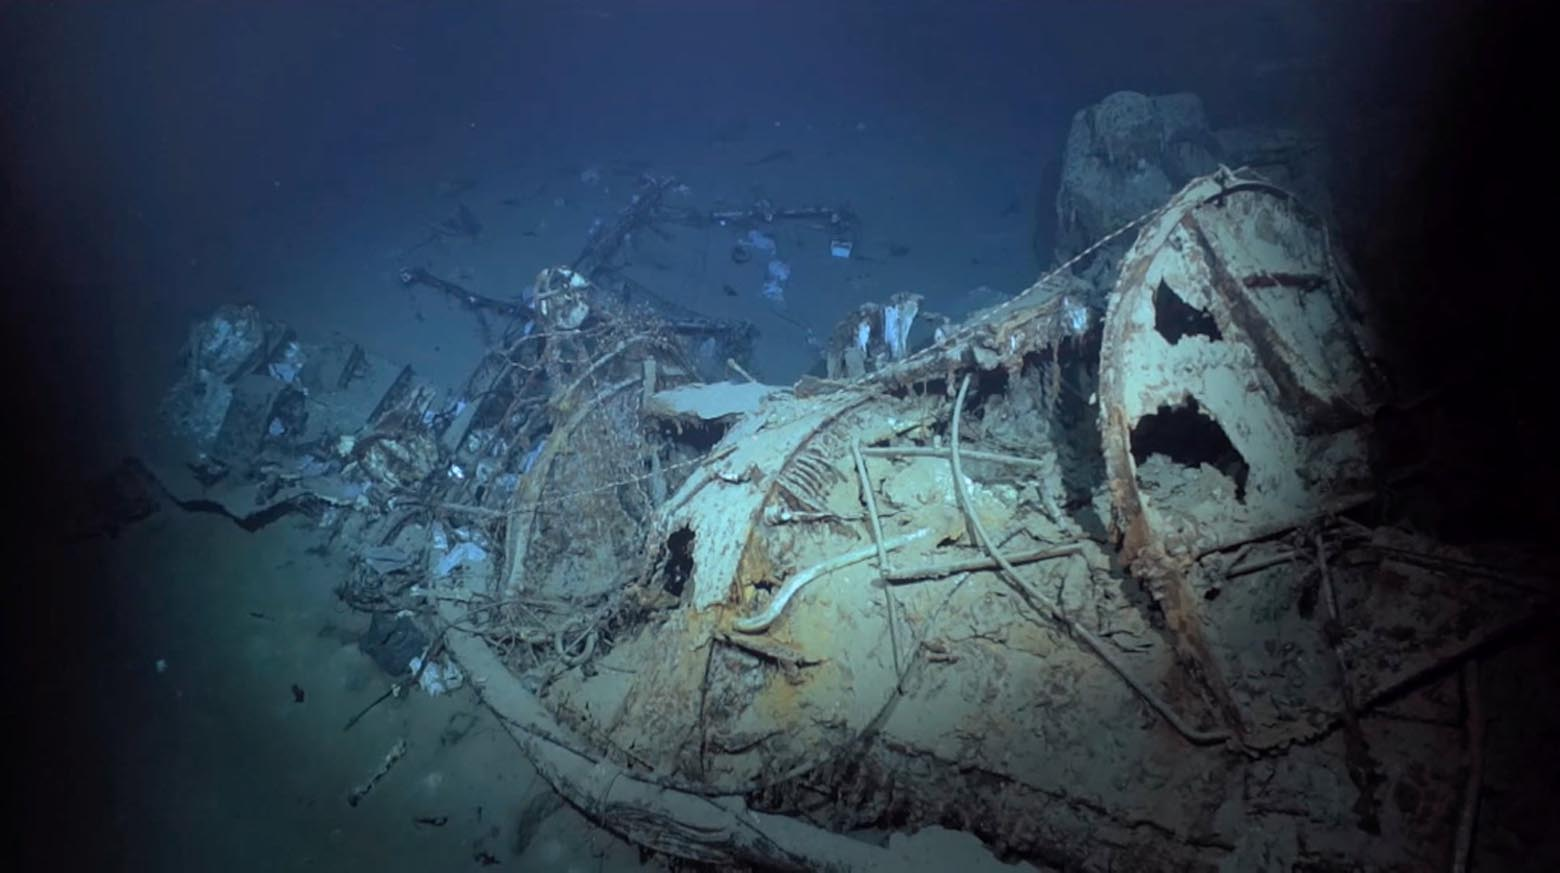 Descubren un destructor hundido de la II Guerra Mundial